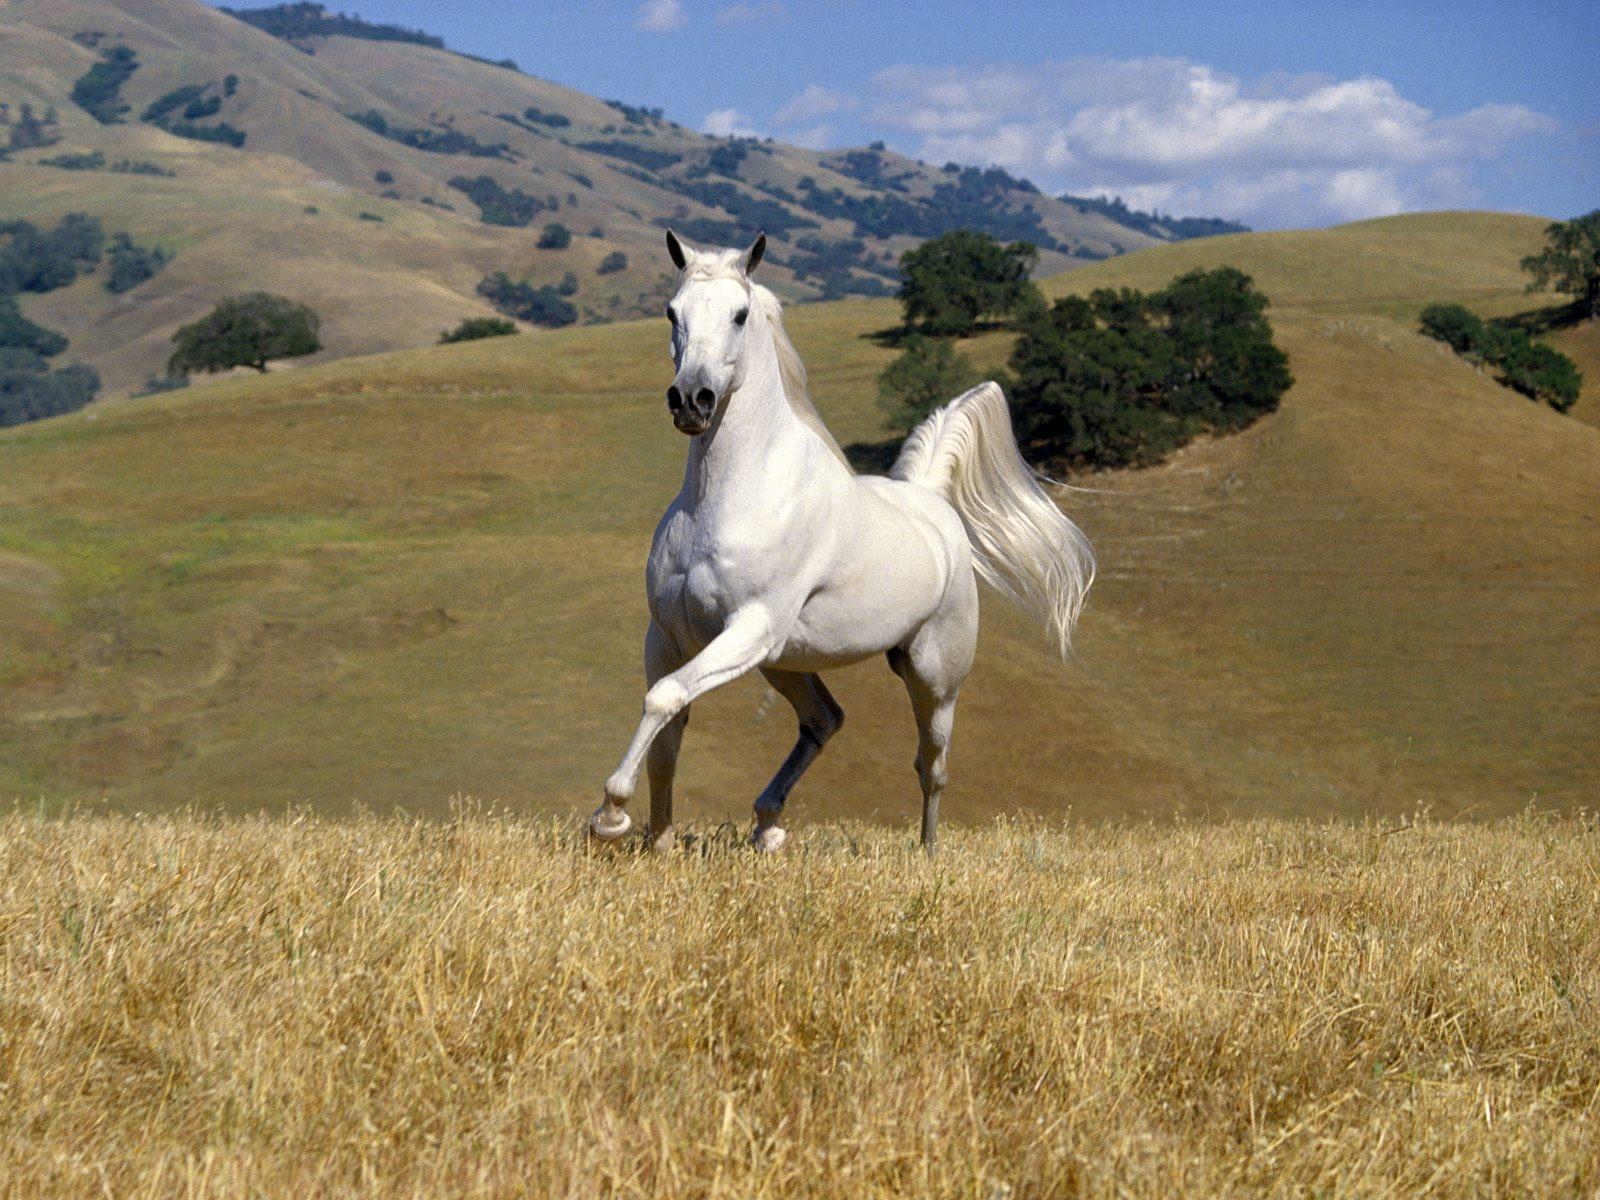 White Wild Horse Wallpapers 1600x1200 619983